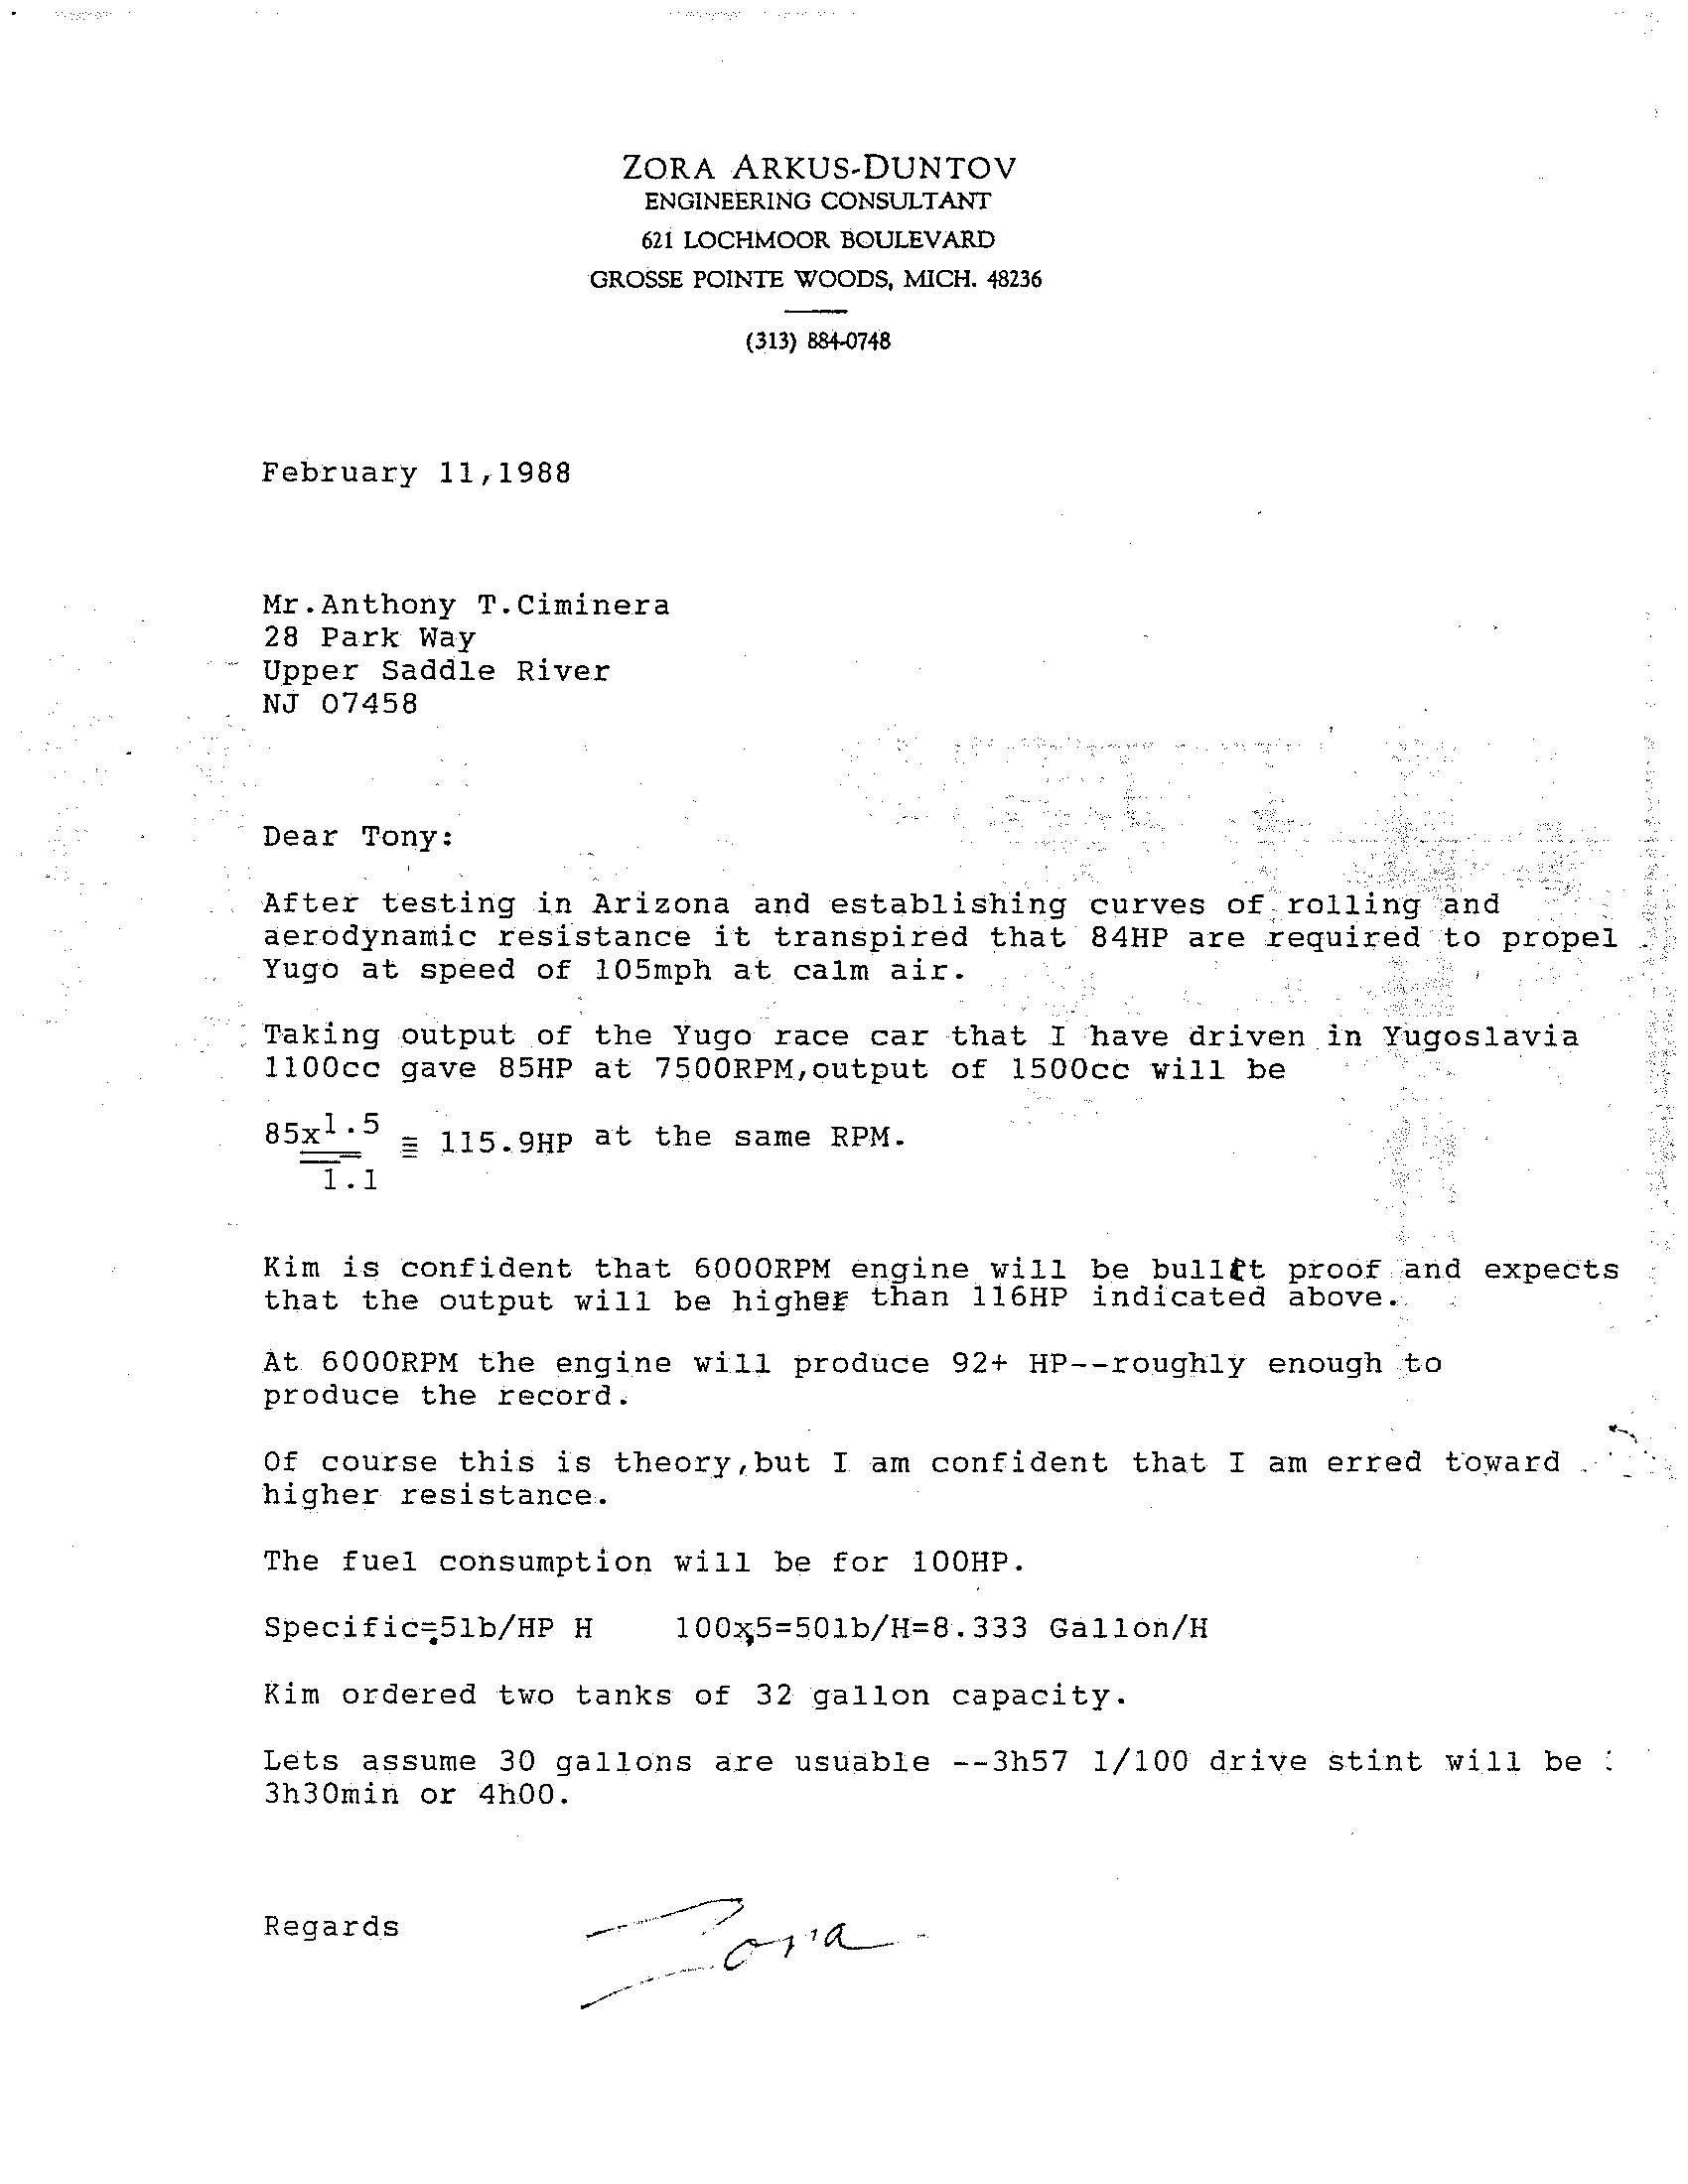 Zora Arkus-Duntov yugo Ciminera letter